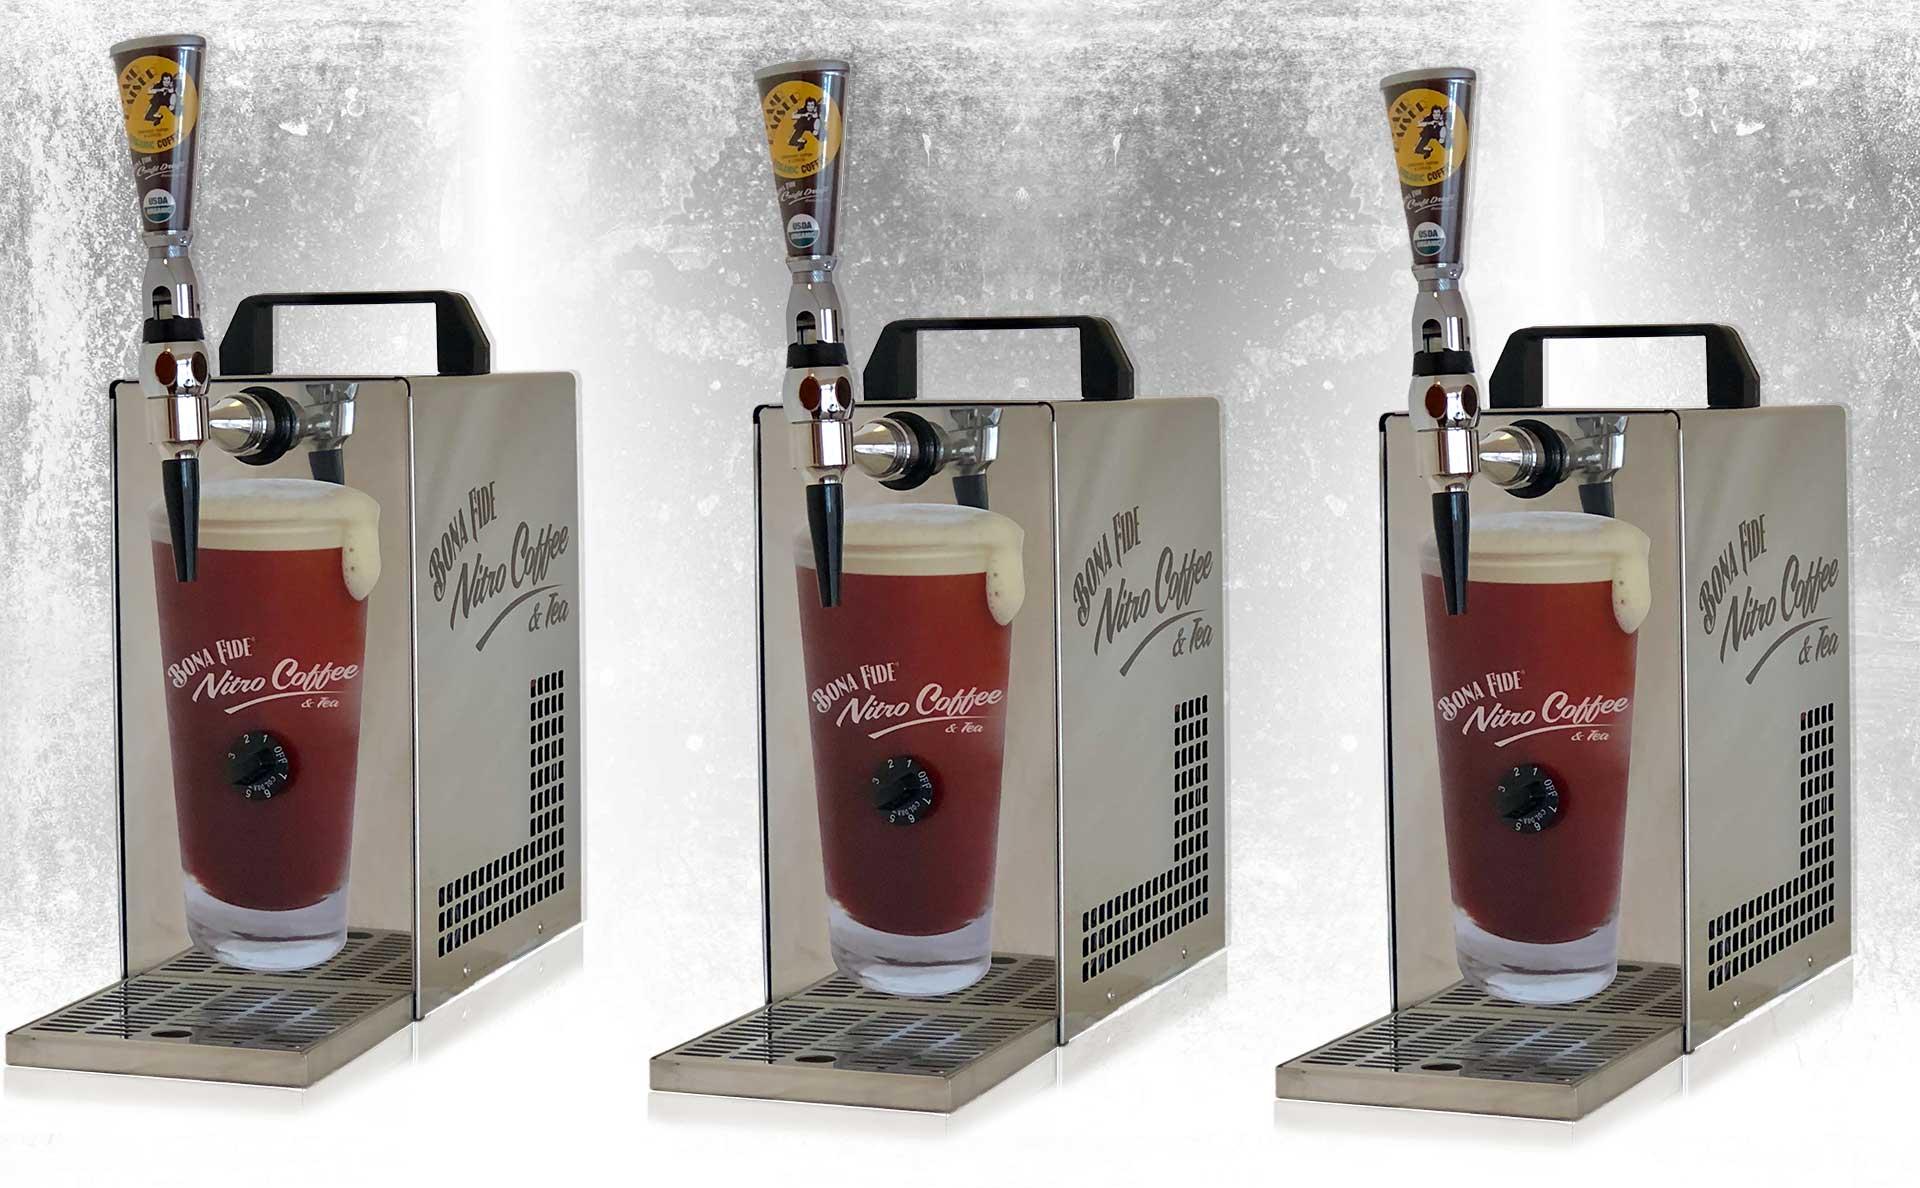 Equipment for nitro coffee Bona Fide